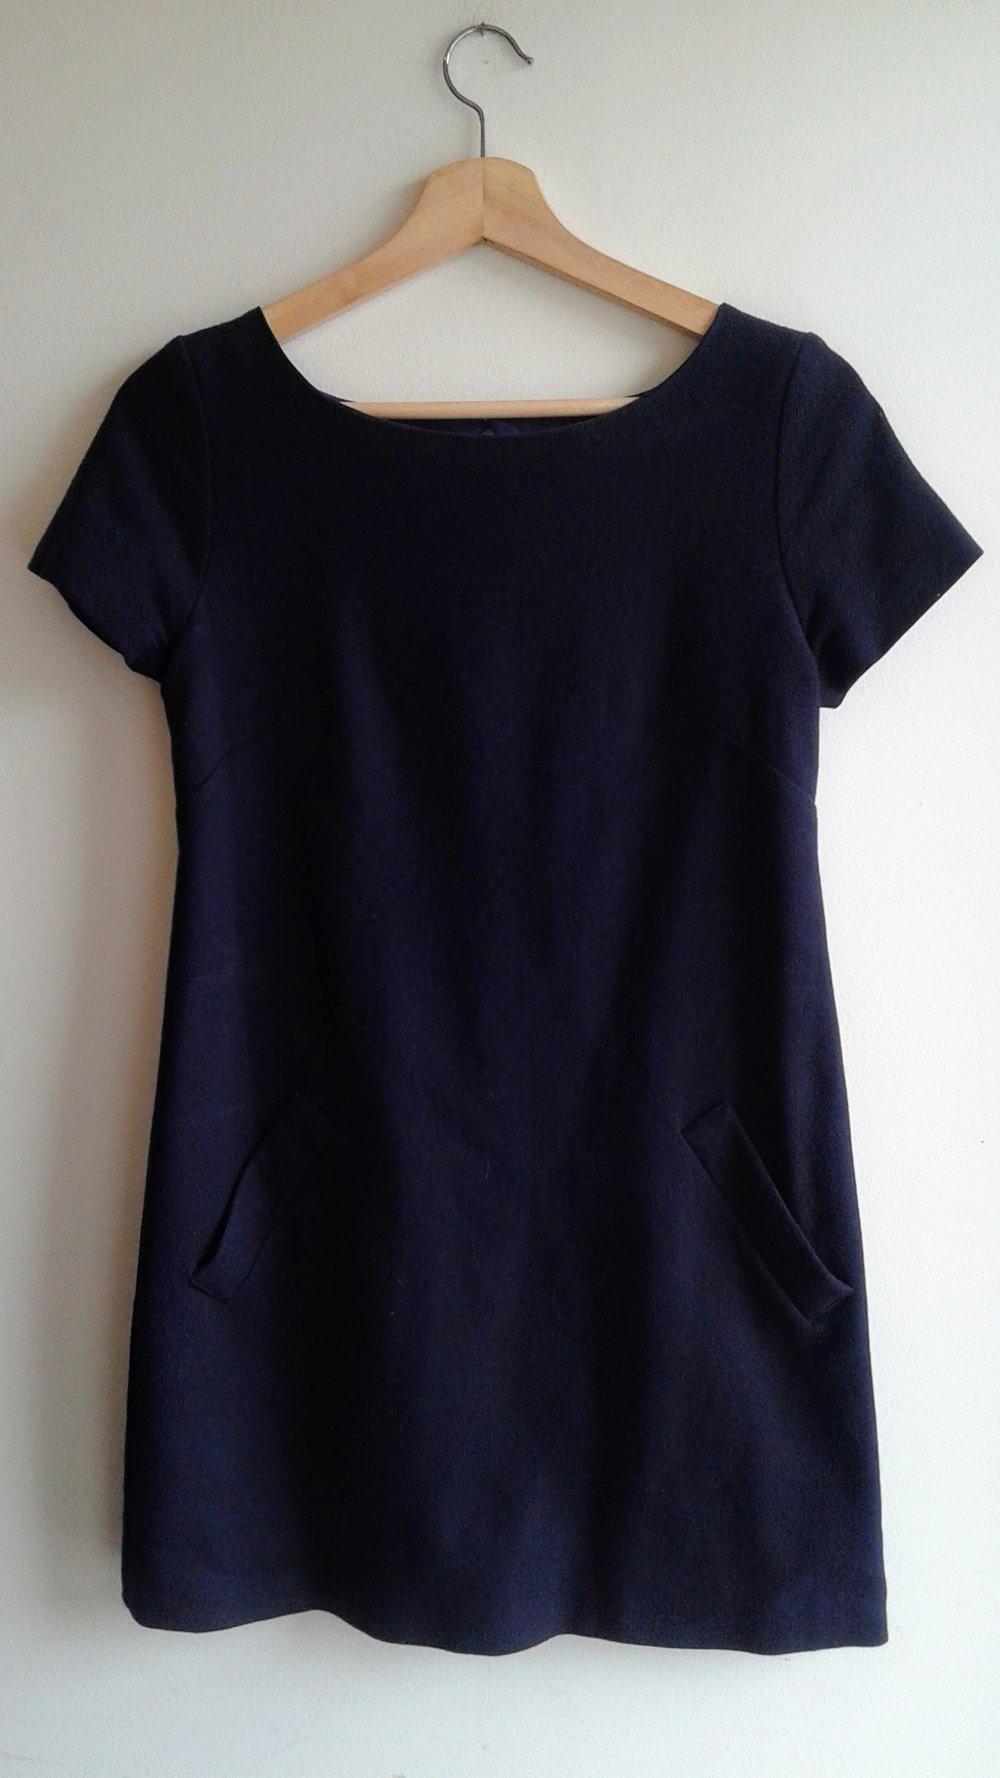 Nokomis dress; Size 4, $40